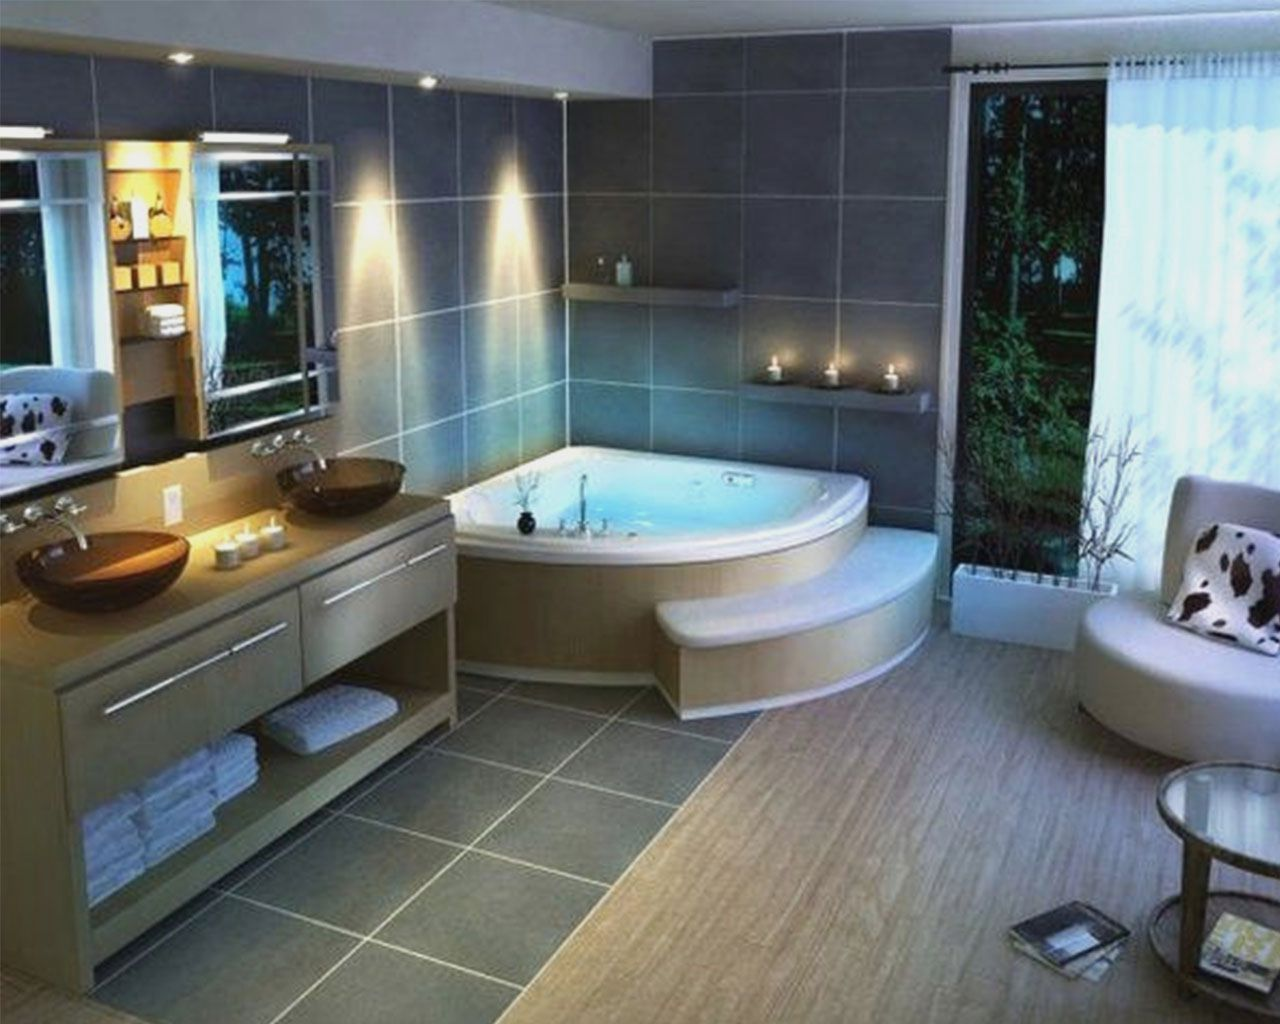 World Best Bathrooms Design  Httphomebeautyfull20160528 Pleasing World Best Bathrooms Design Design Decoration